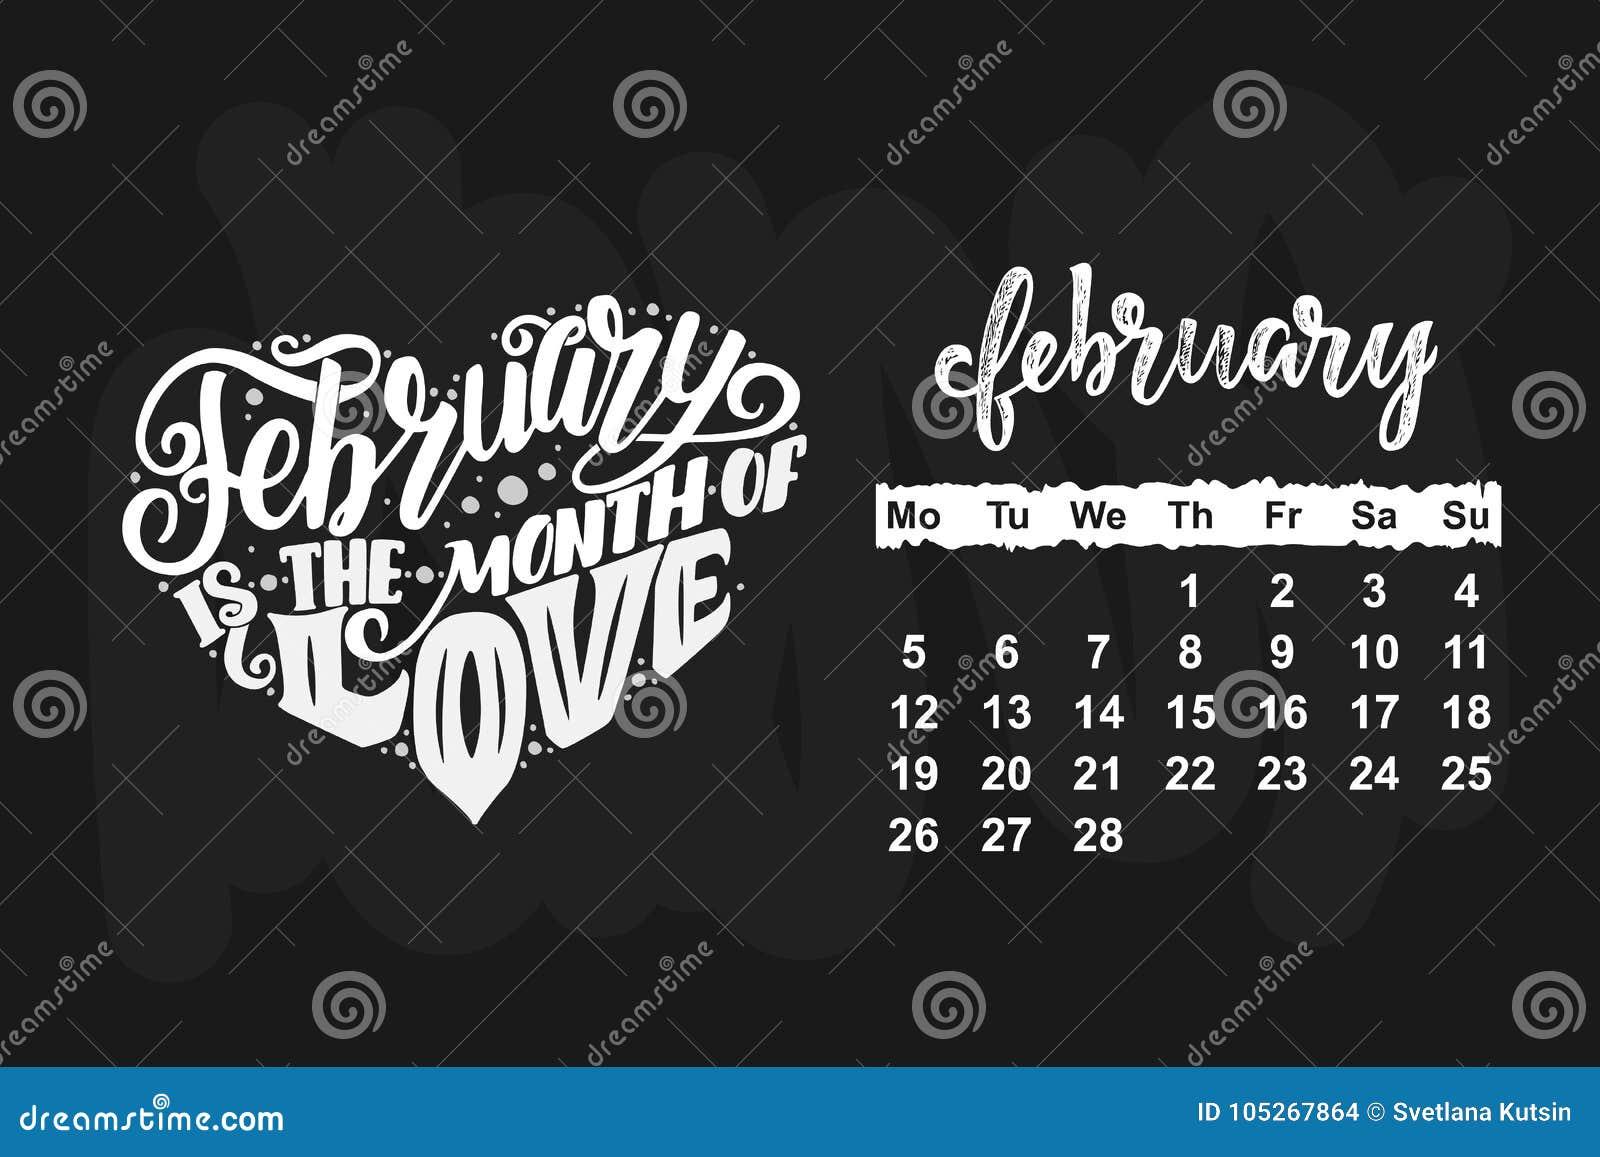 Calendar Design Quote : Tea towel calendars theoriginalthread